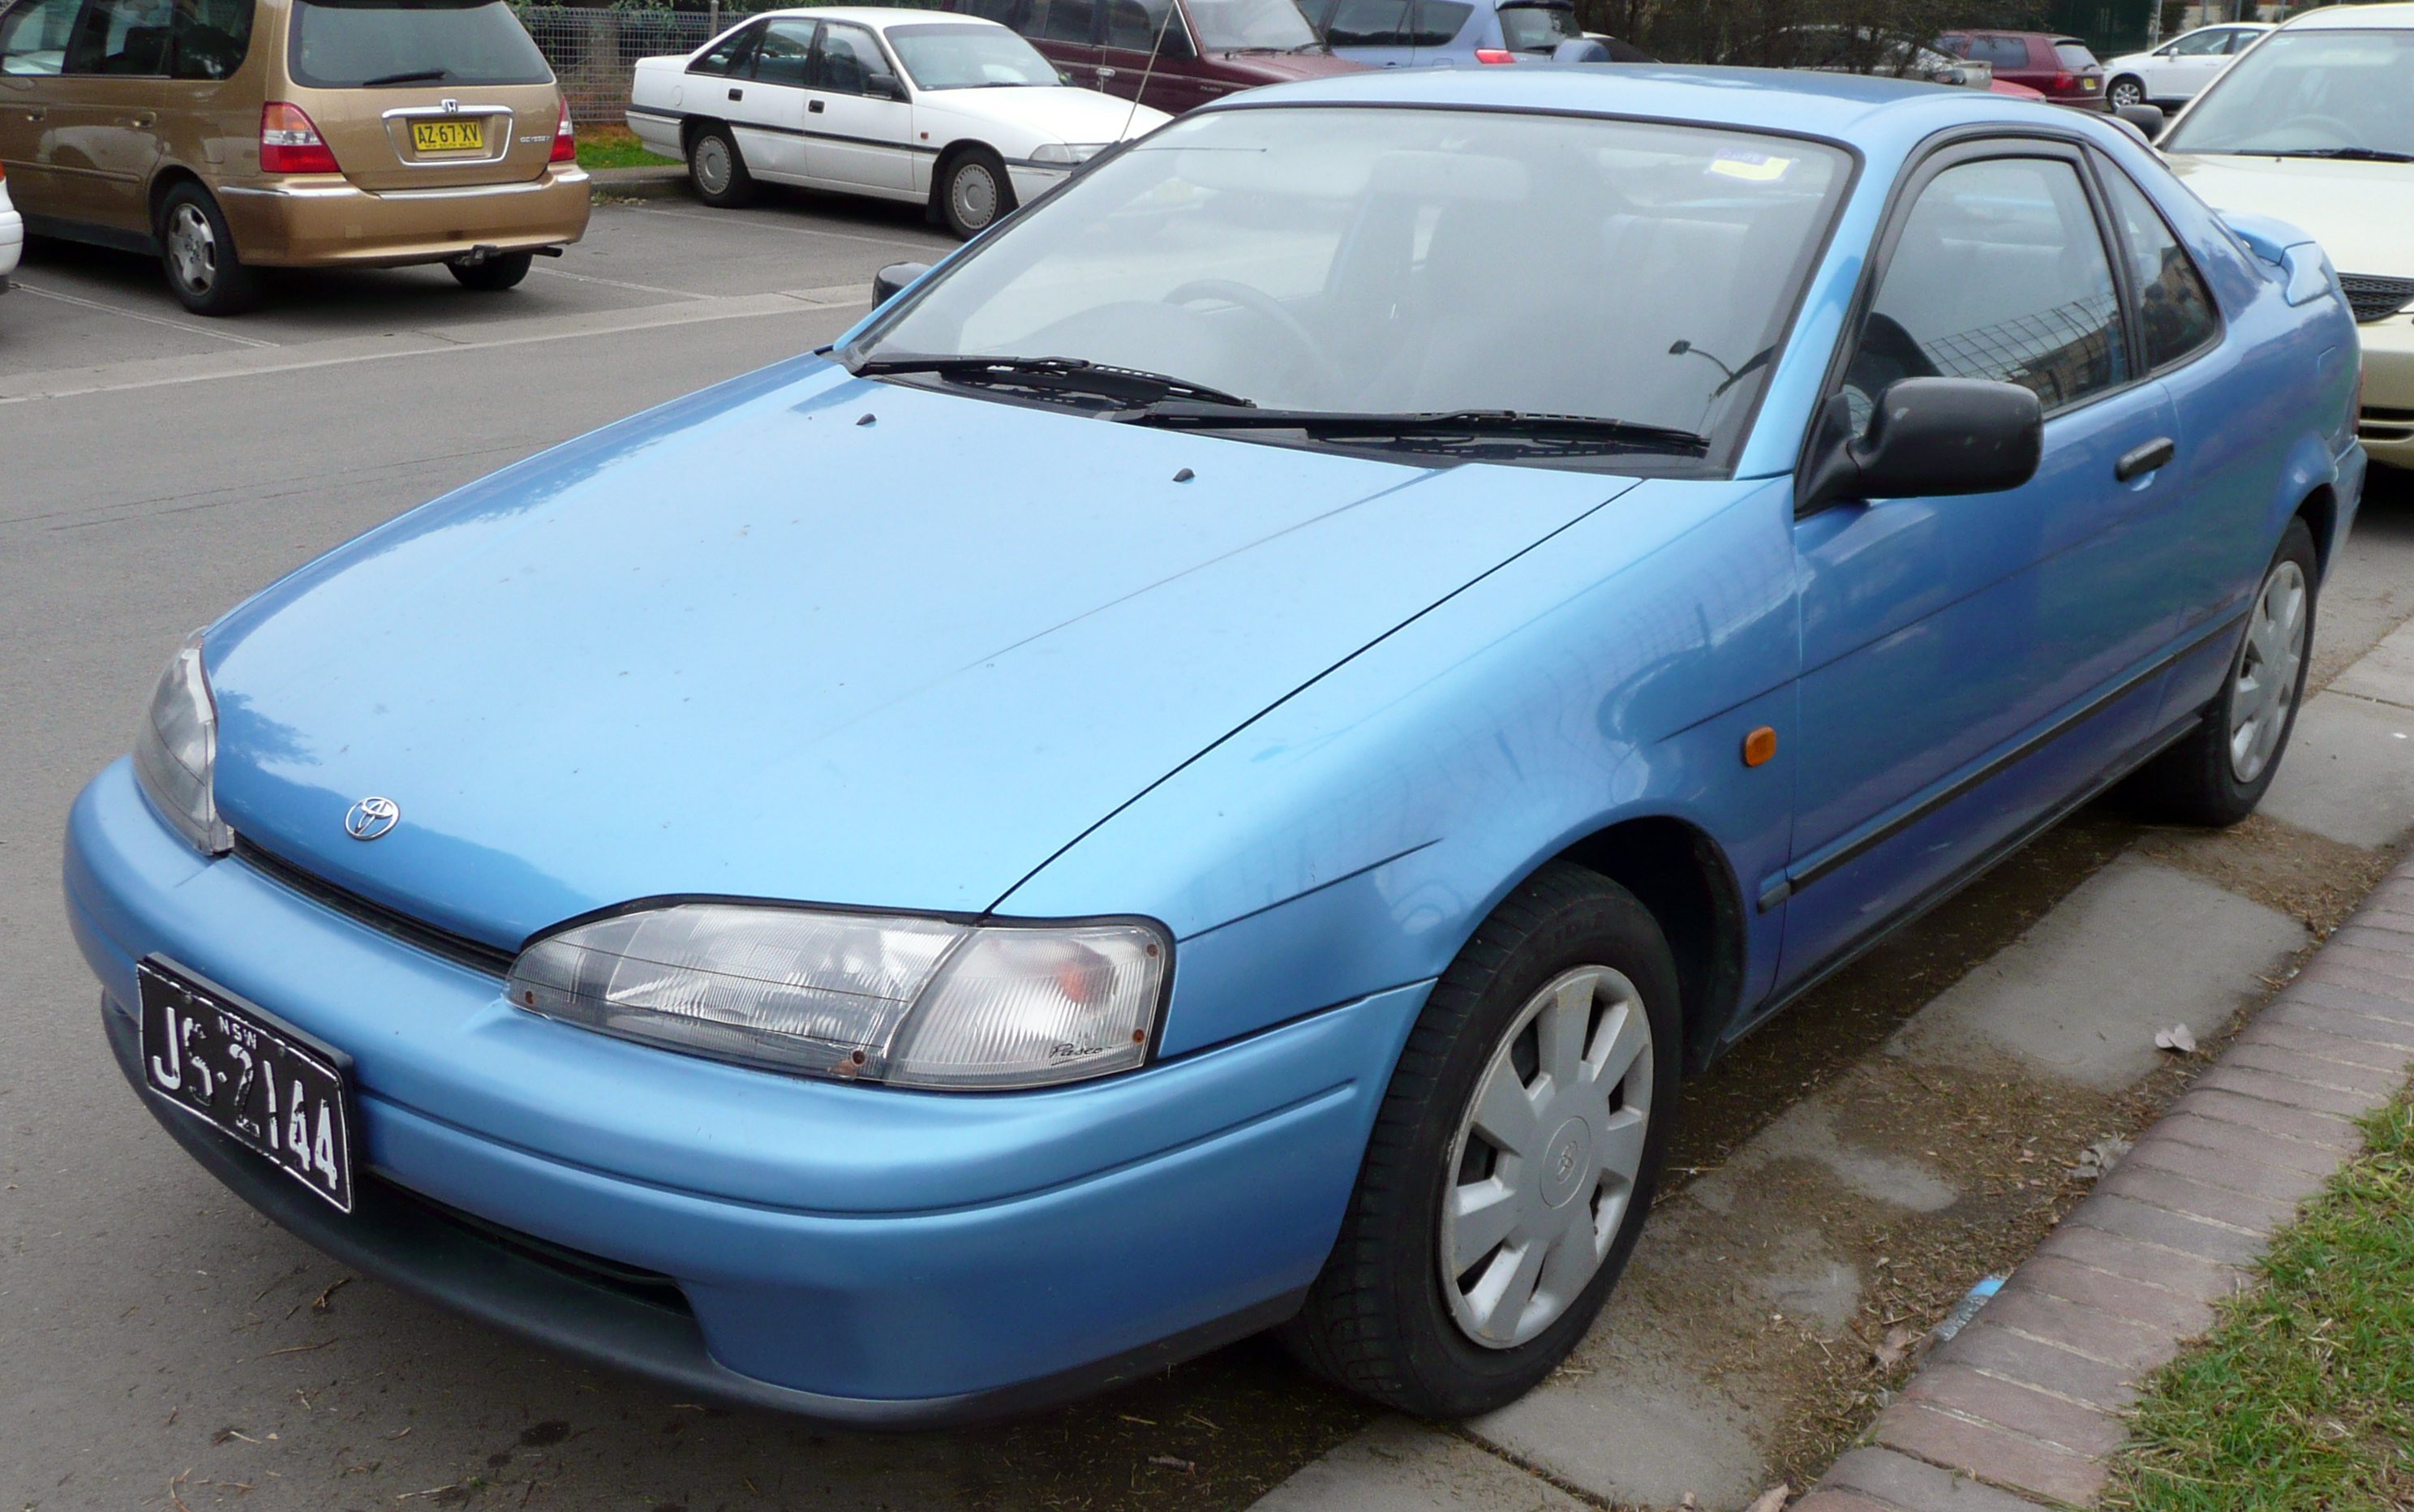 Toyota Paseo I (L40) 1991 - 1996 Coupe #2